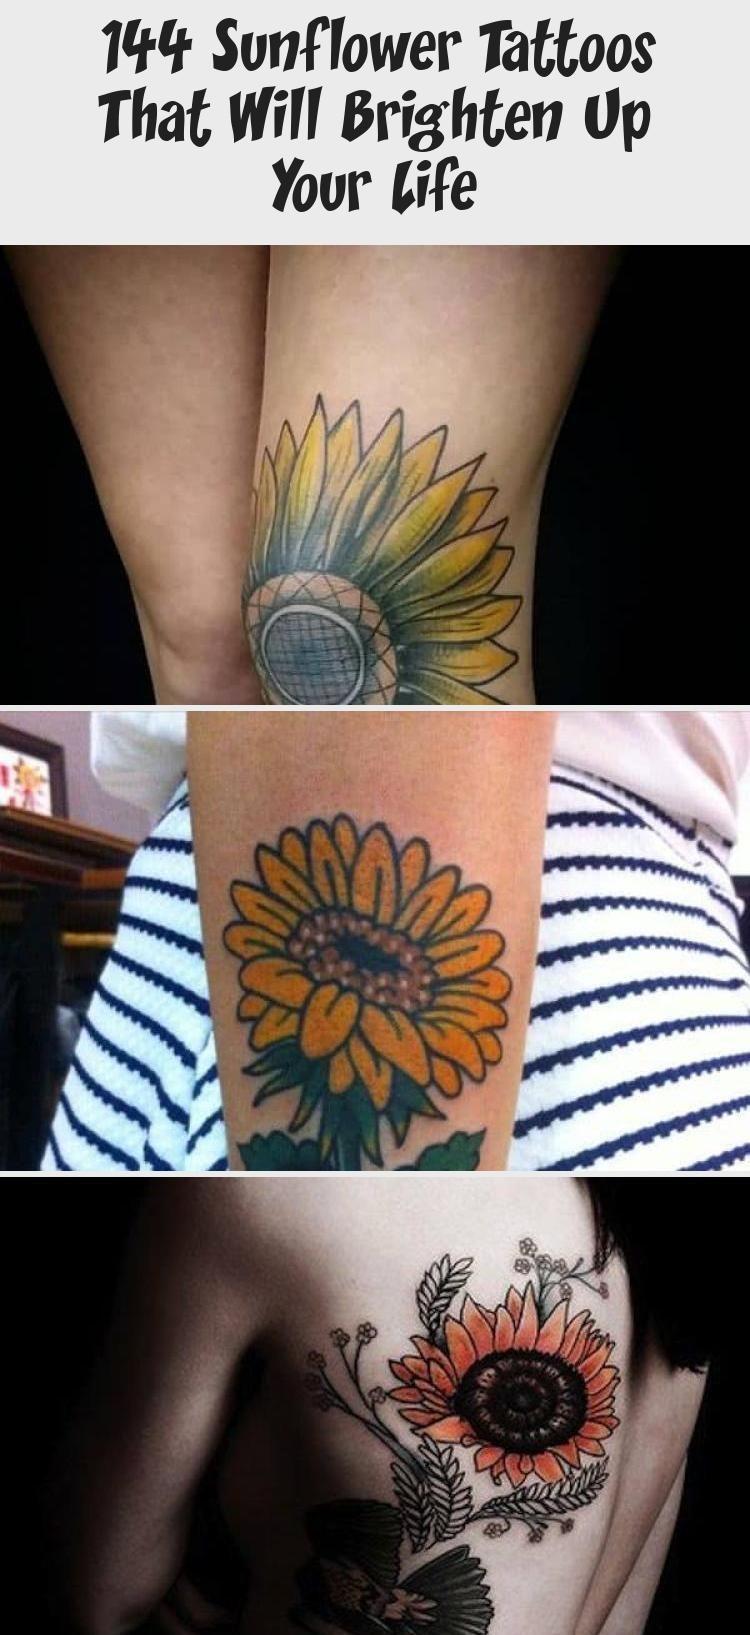 Photo of 144 Sunflower Tattoos That Will Brighten Up Your Life | Sunflower Tattoo hippie …